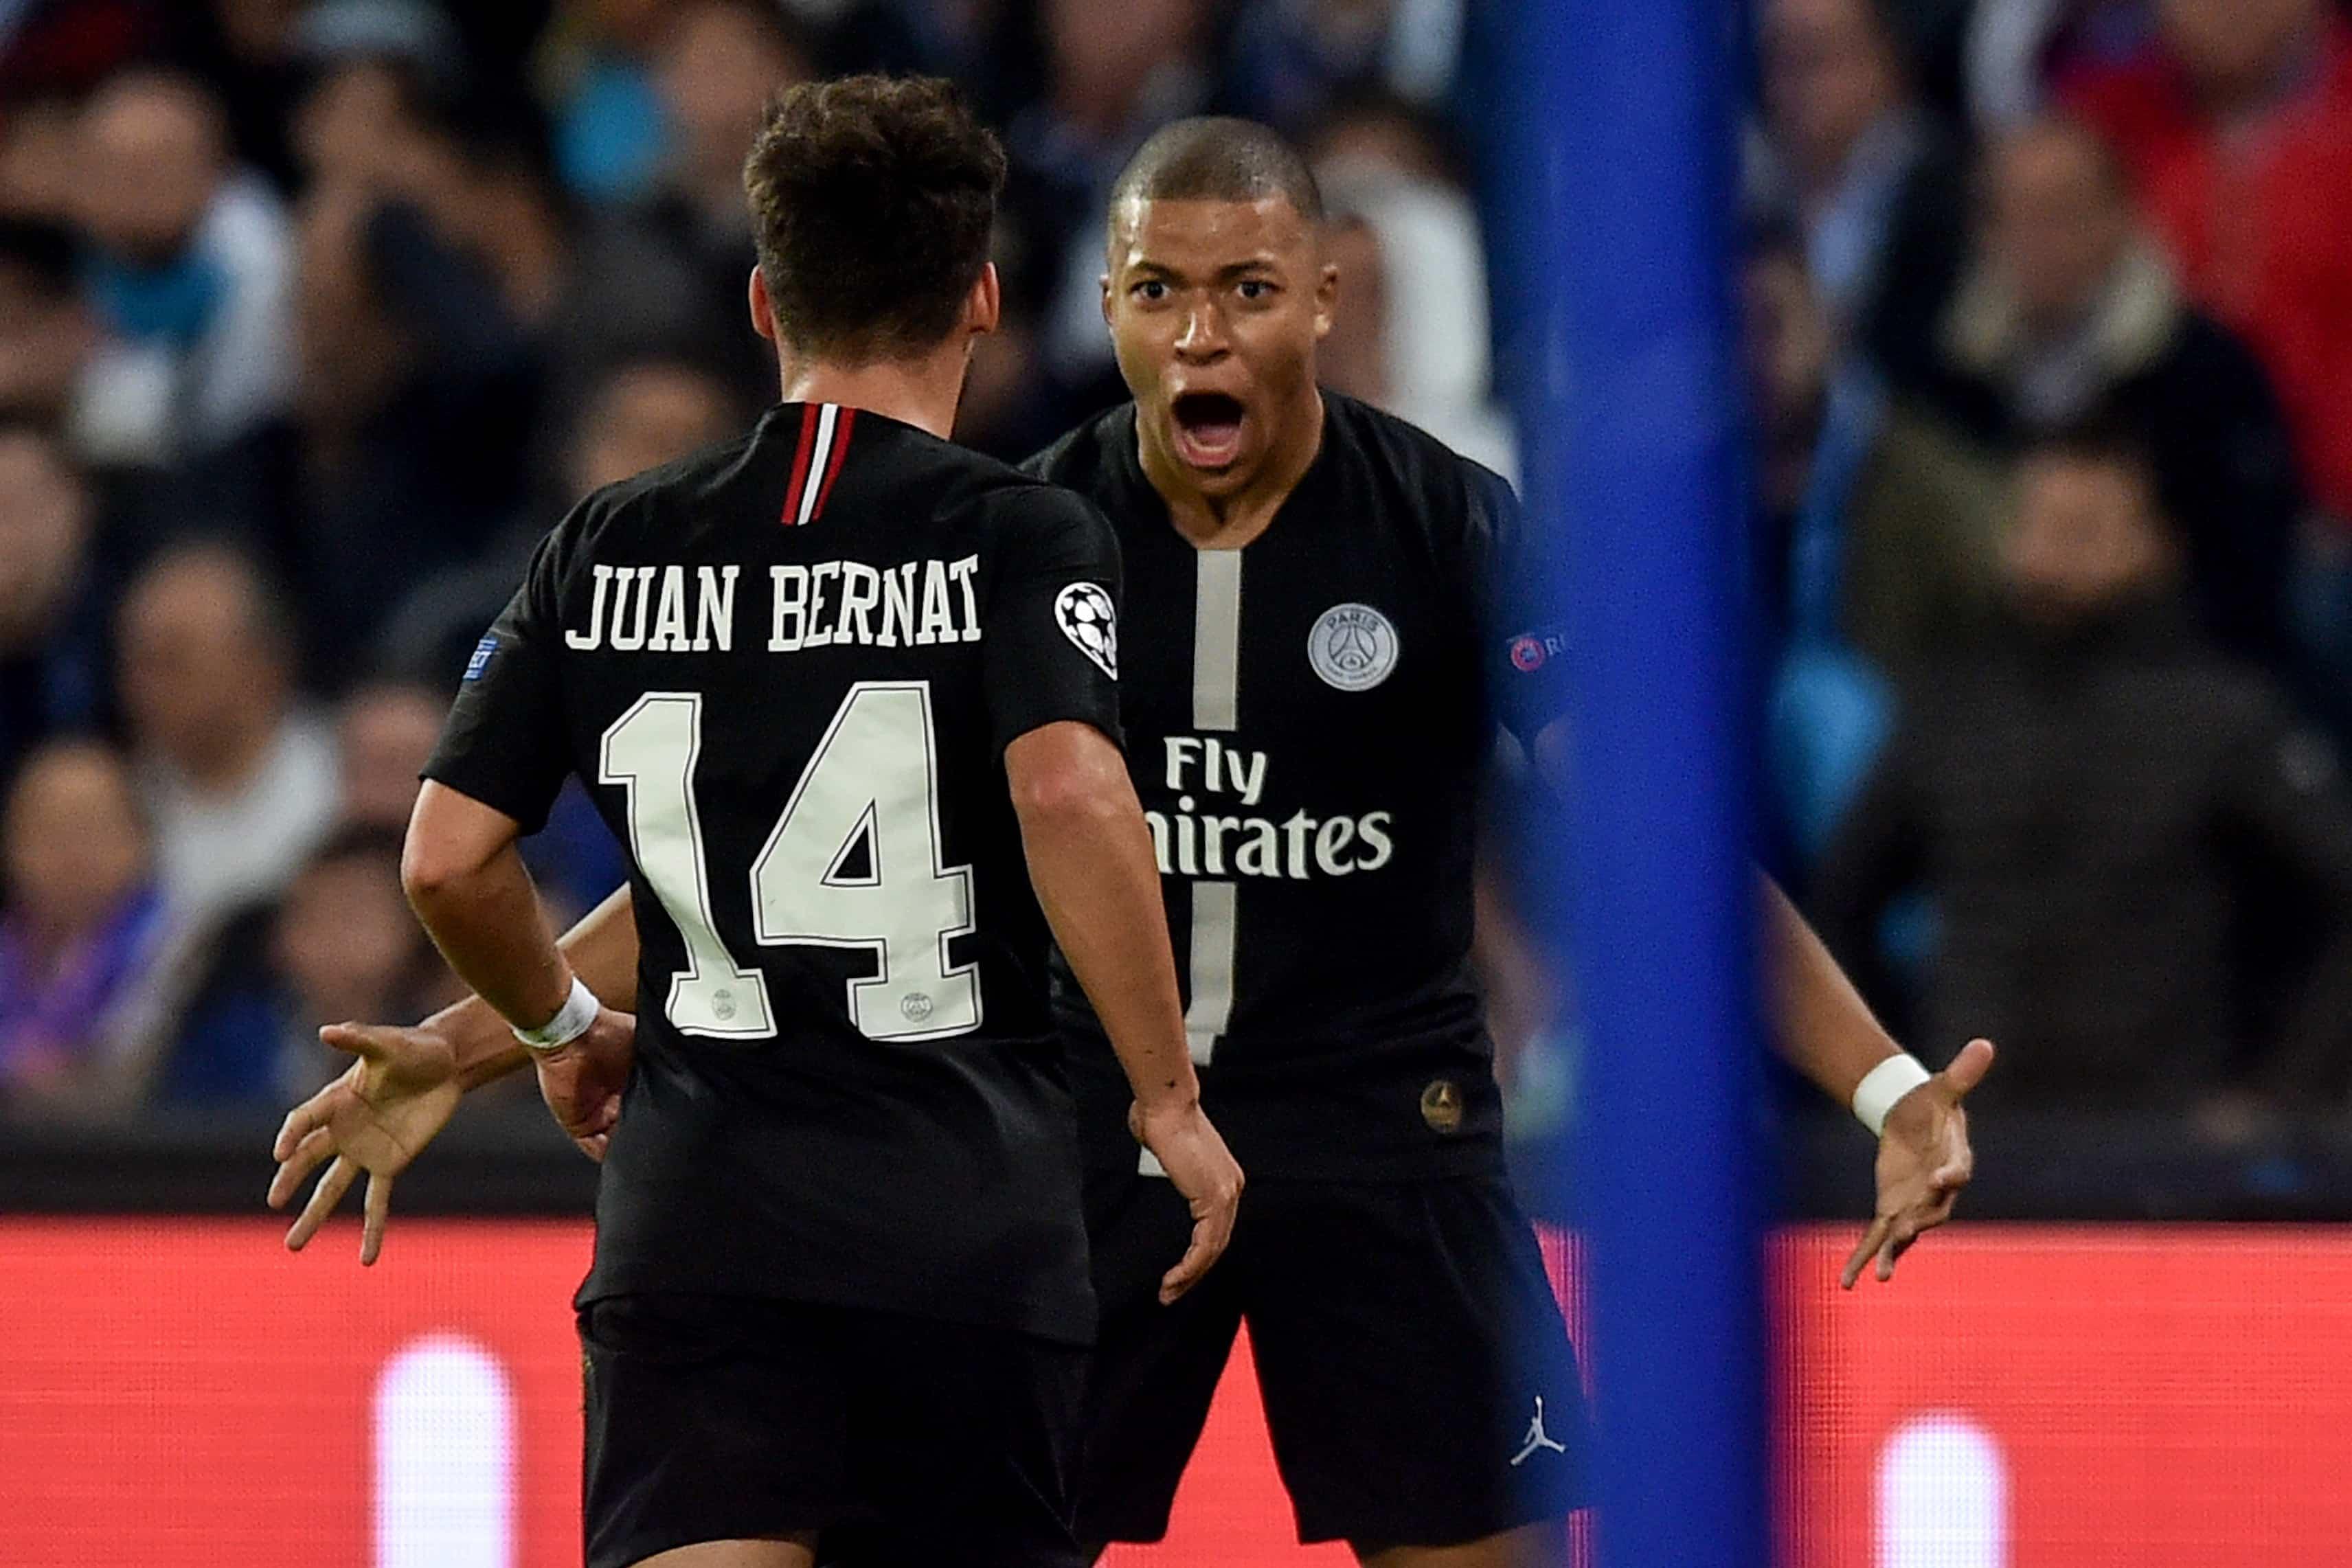 Calendario Ligue 1.Calendario Ligue 1 2018 2019 Date Inizio E Fine Turni